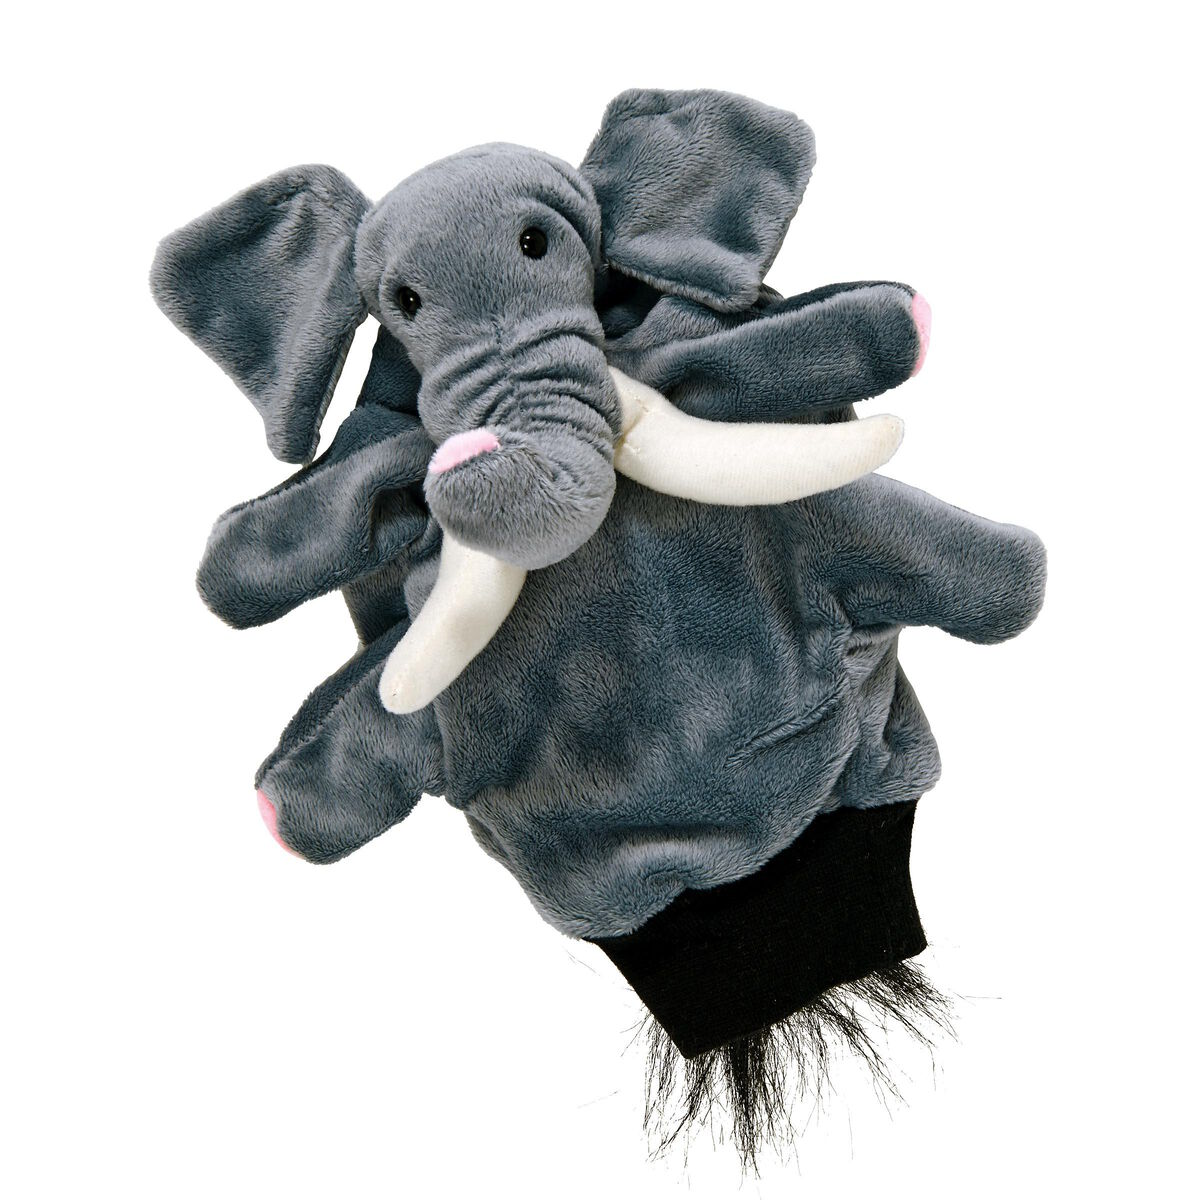 WILD GUYS Handpuppe Elefant